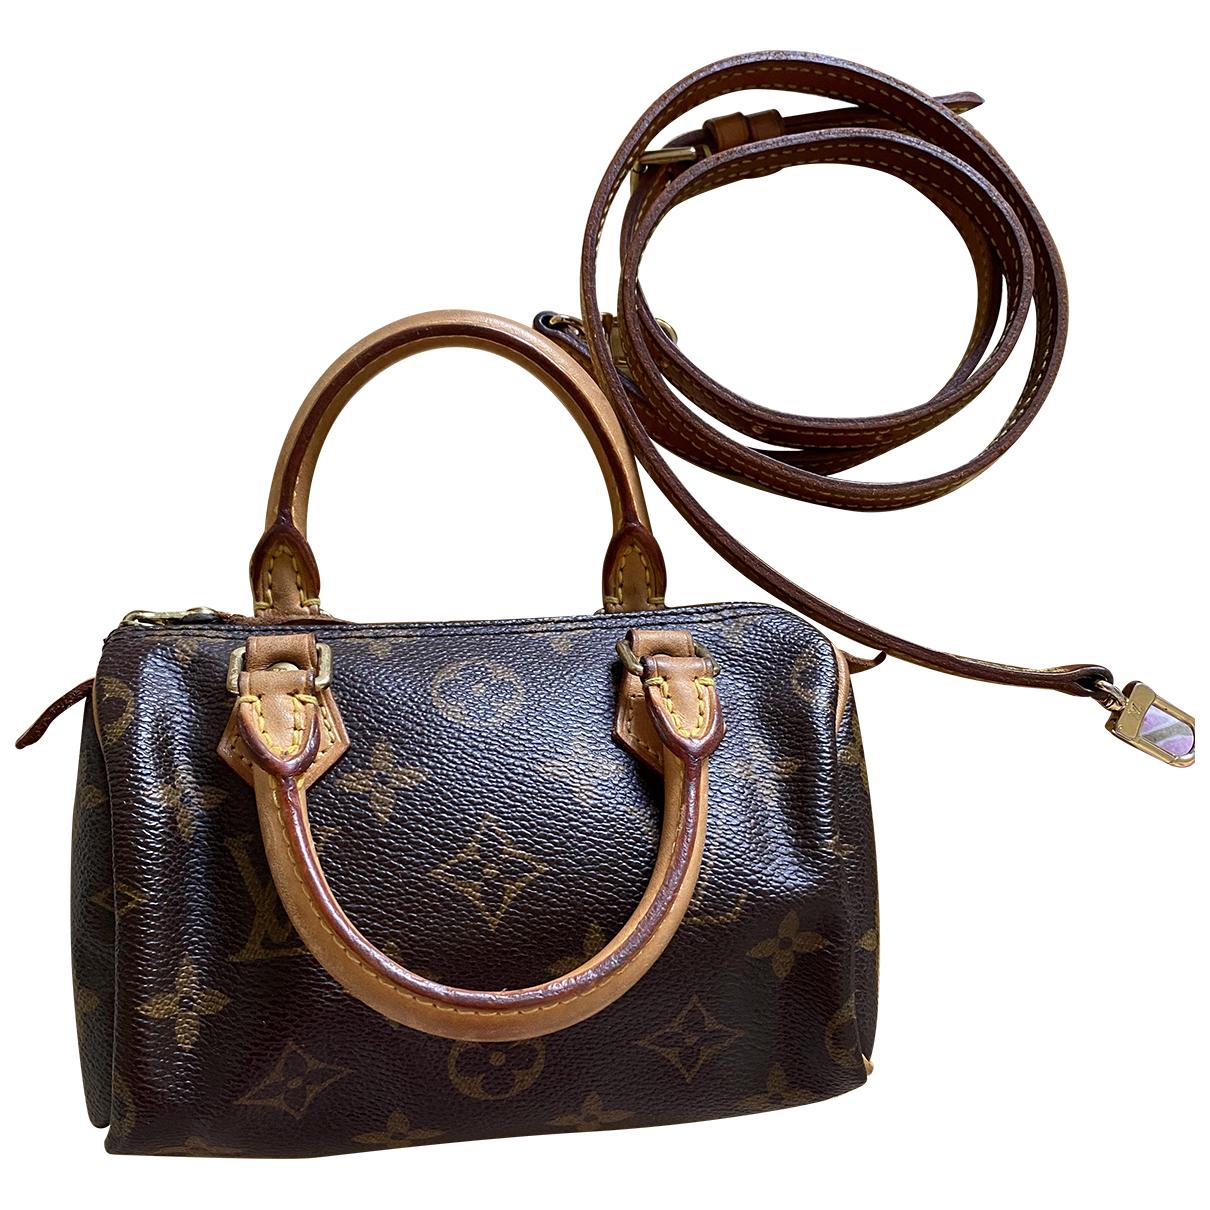 Louis Vuitton Nano Speedy / Mini HL Brown Leather handbag for Women N